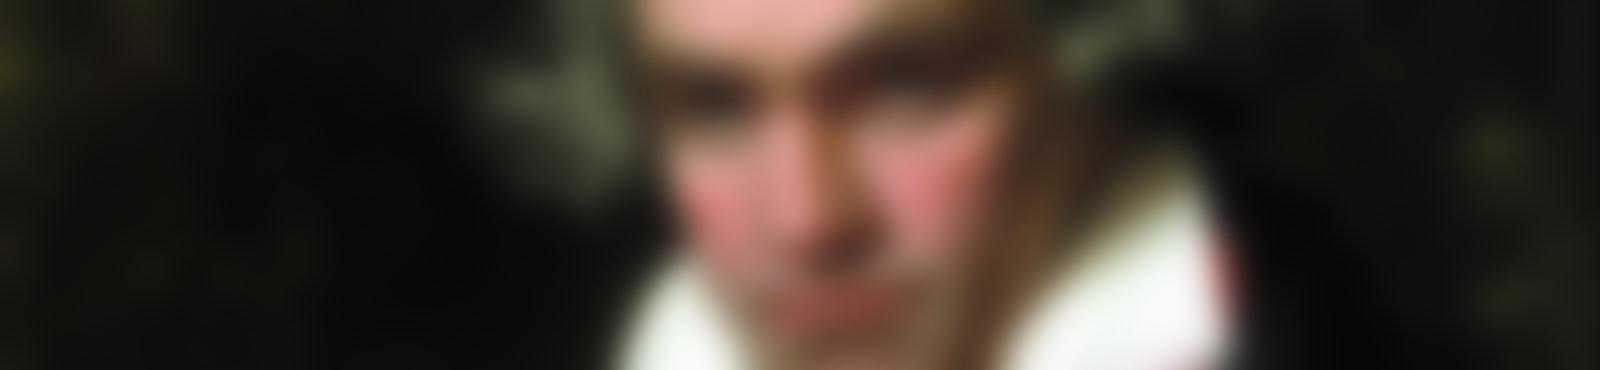 Blurred 6598b580 7d2d 4958 a645 2f0af541a654